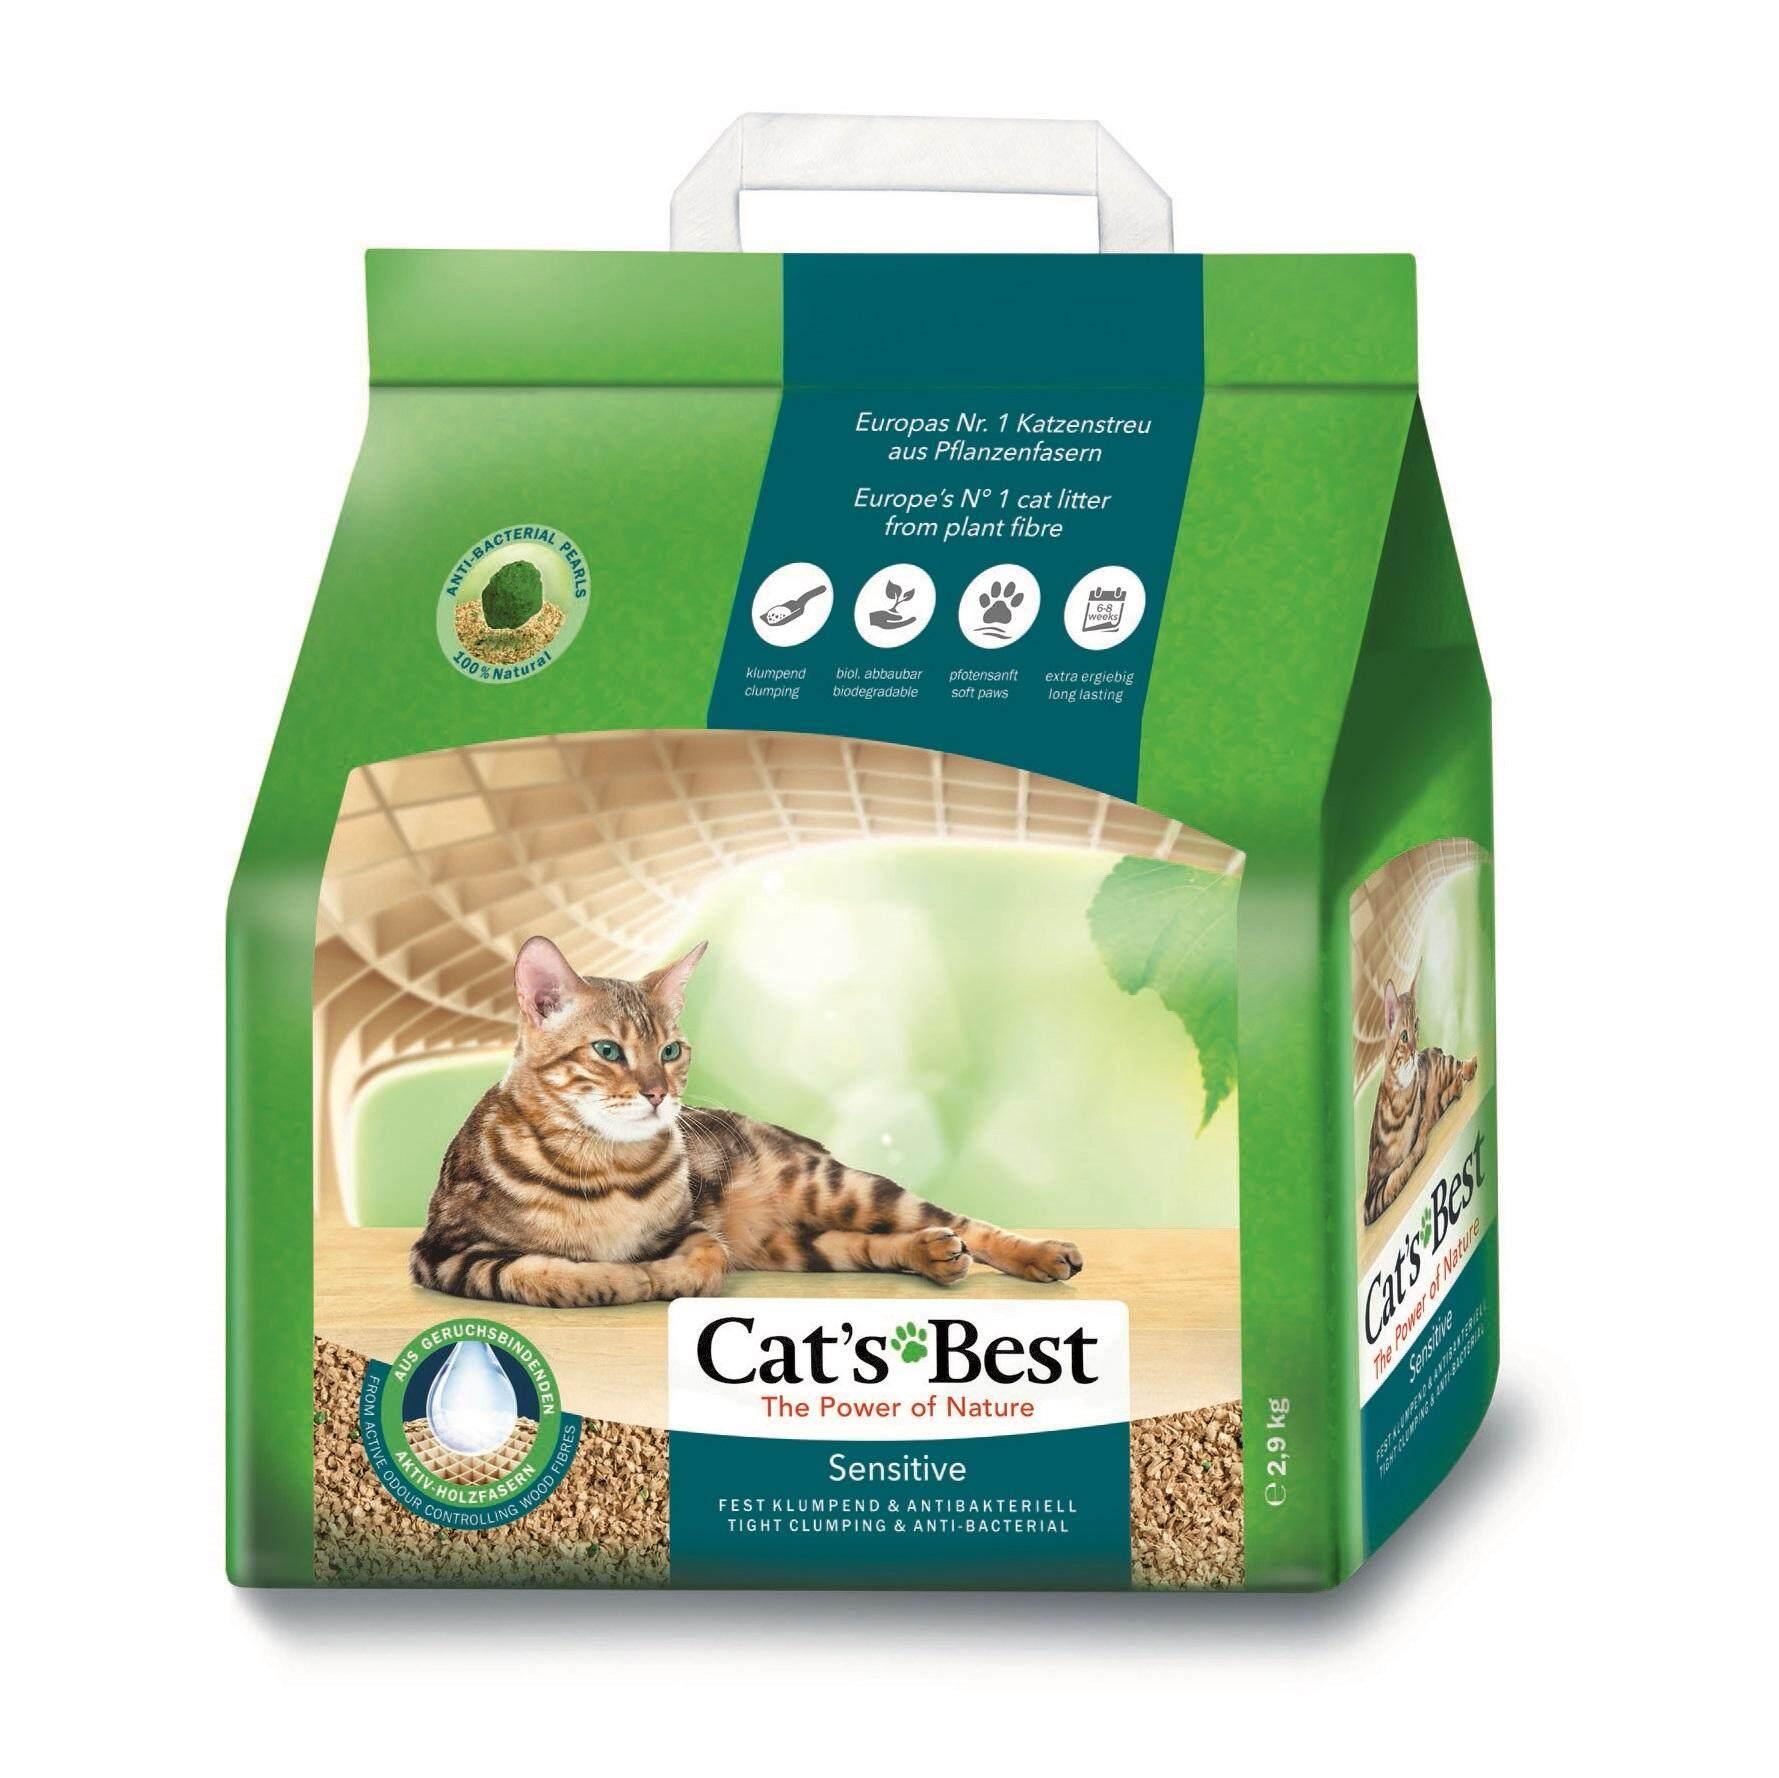 Cats Best Sensitive ทรายแมว 8 ลิตร (2.9 กก.).